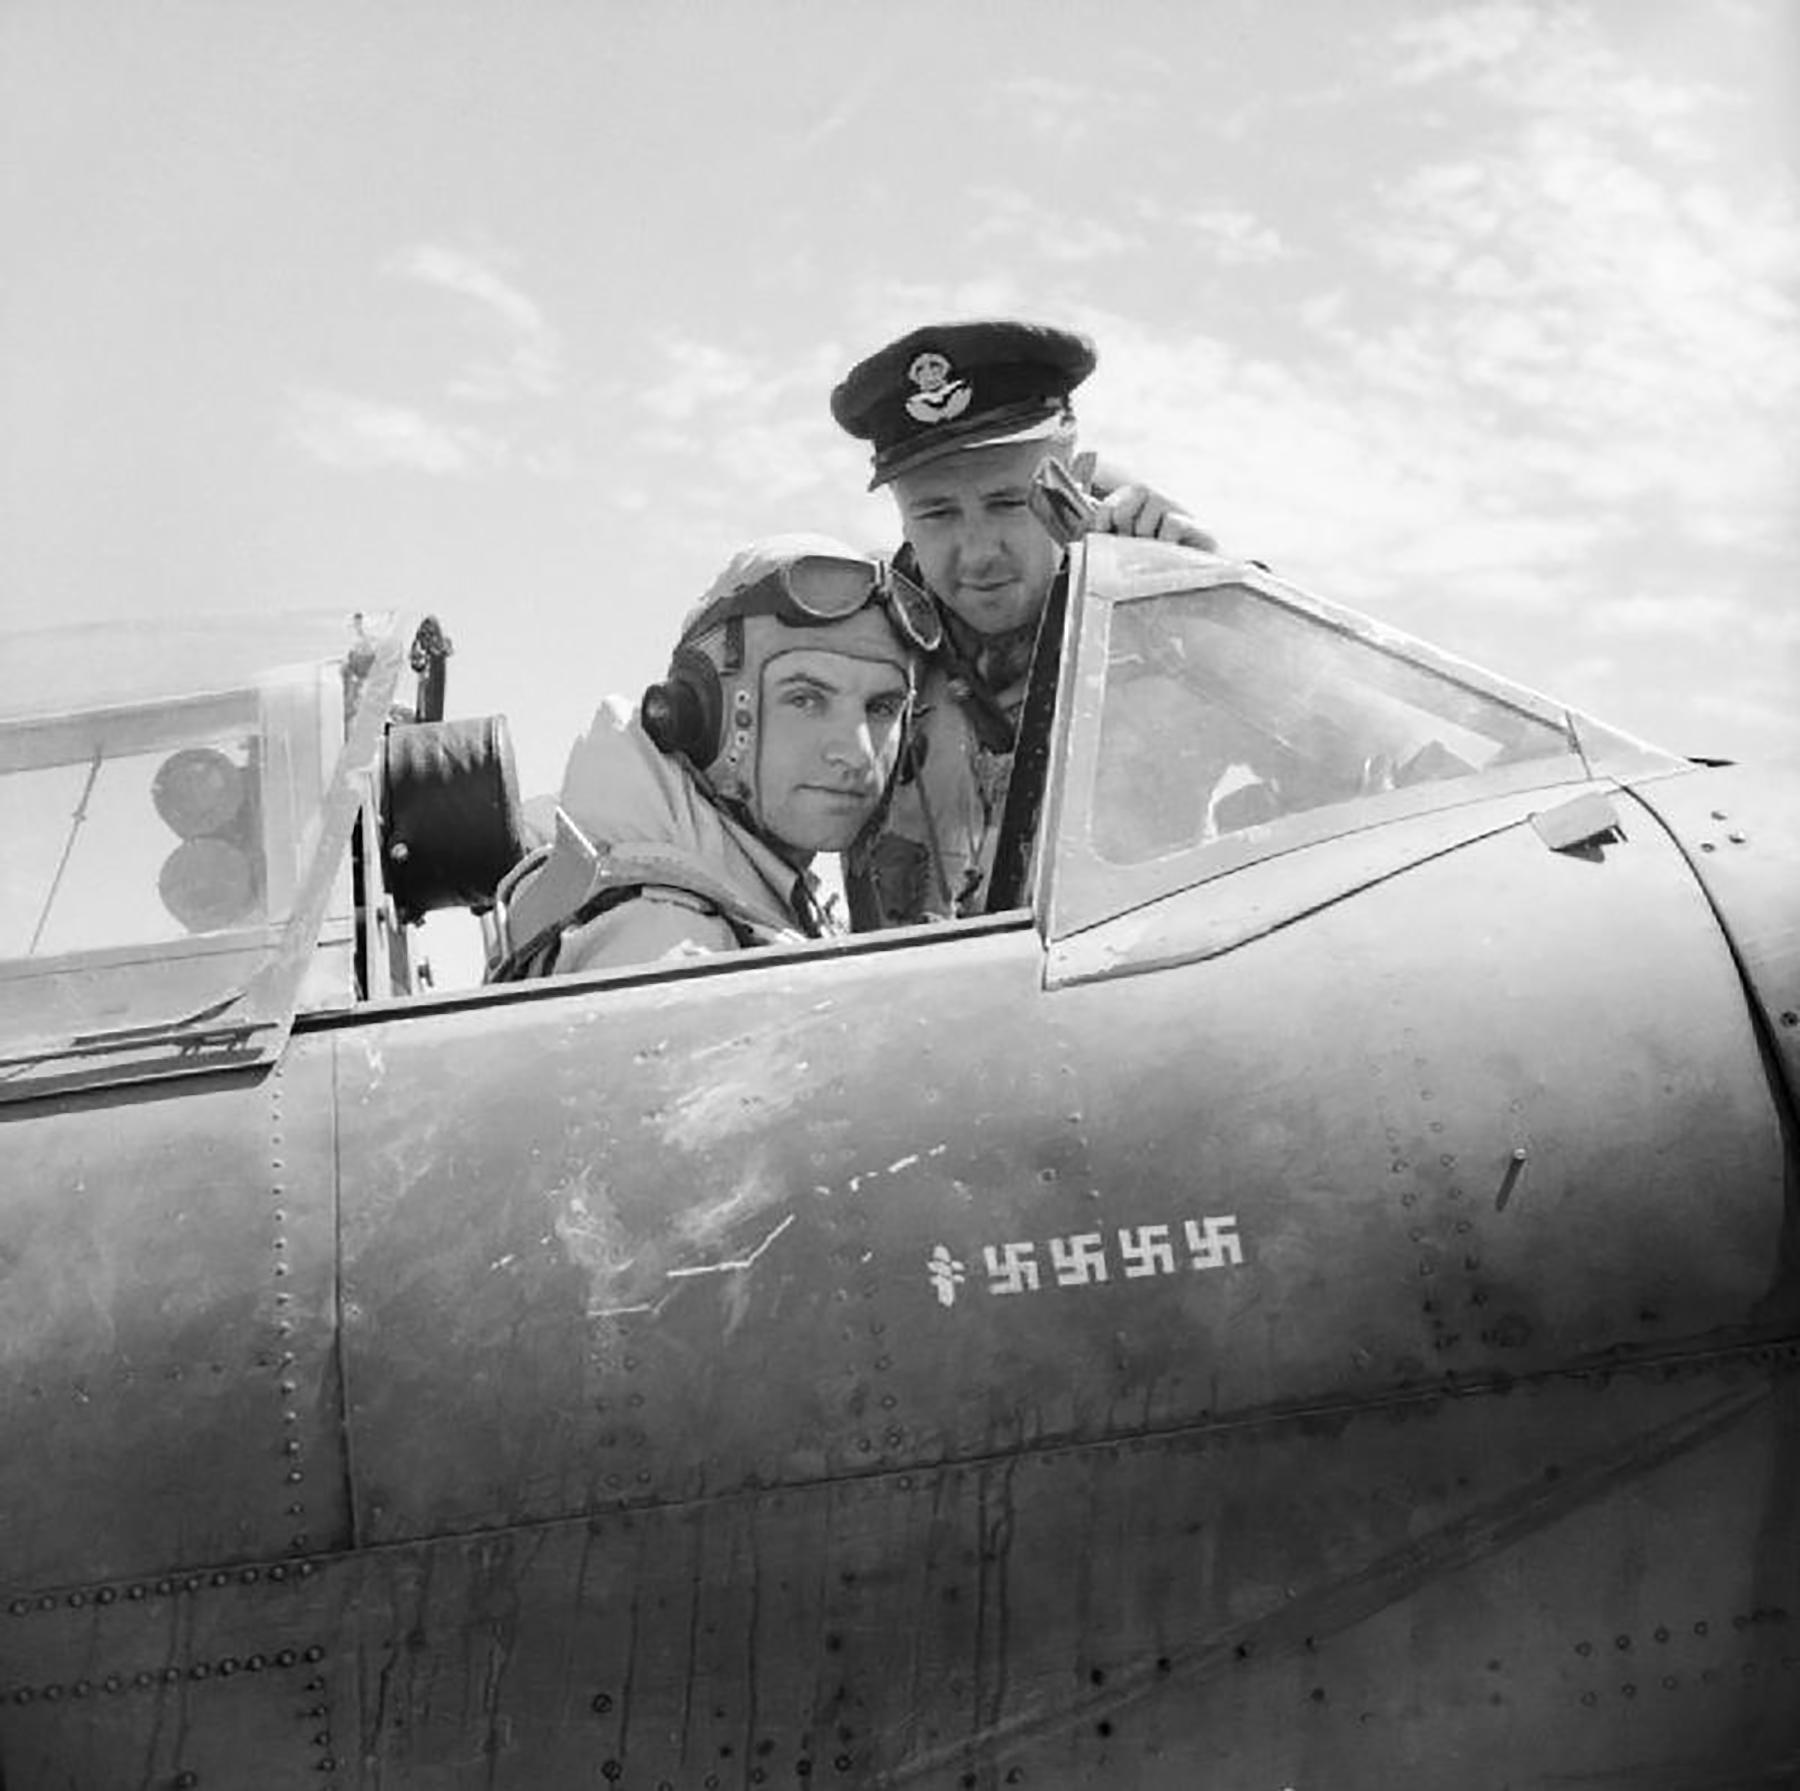 Spitfire MkVcTrop RAF 601Sqn Dennis Barnham Luqa Malta June 1942 IWM 1001